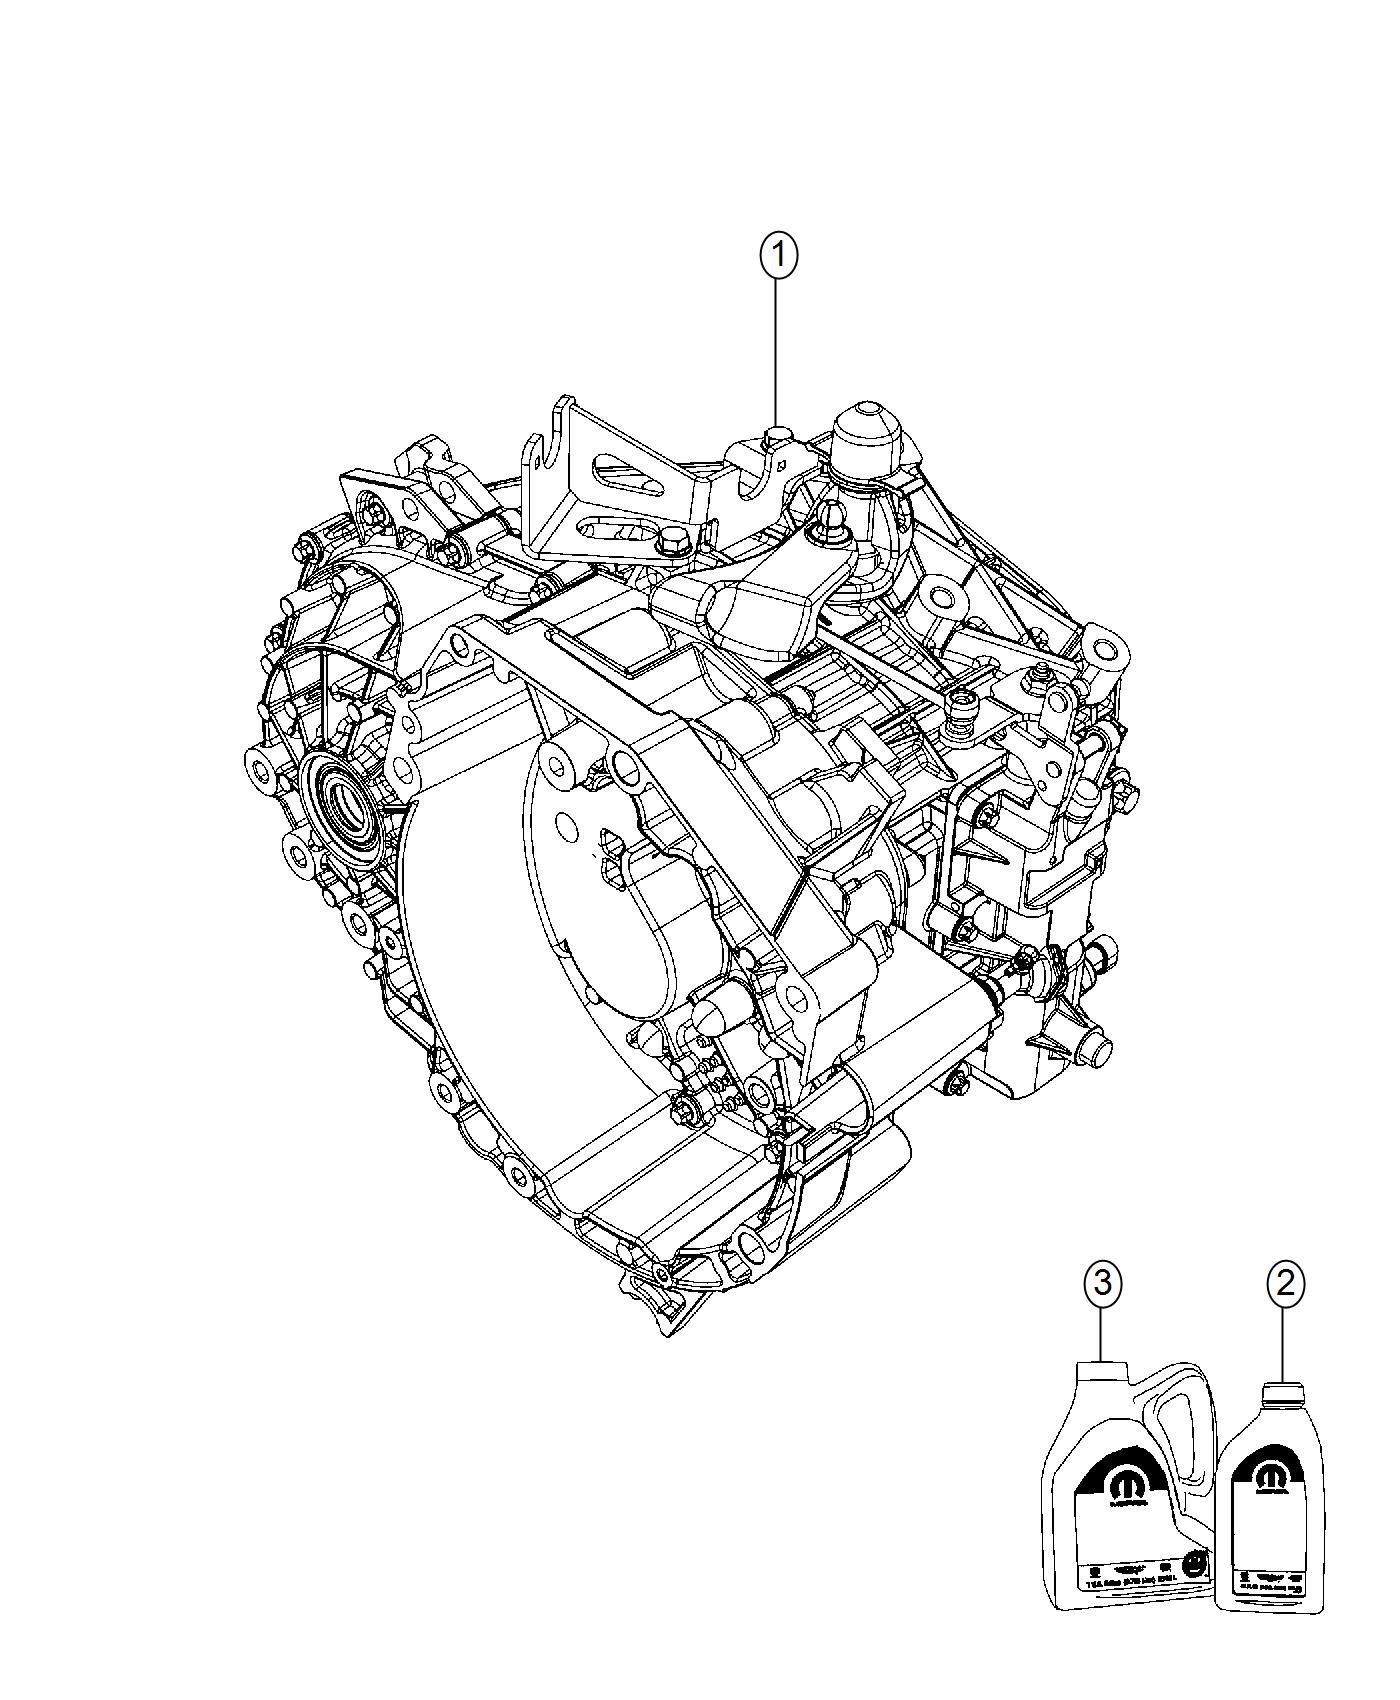 Jeep Renegade Transmission. 6 speed. Transaxle